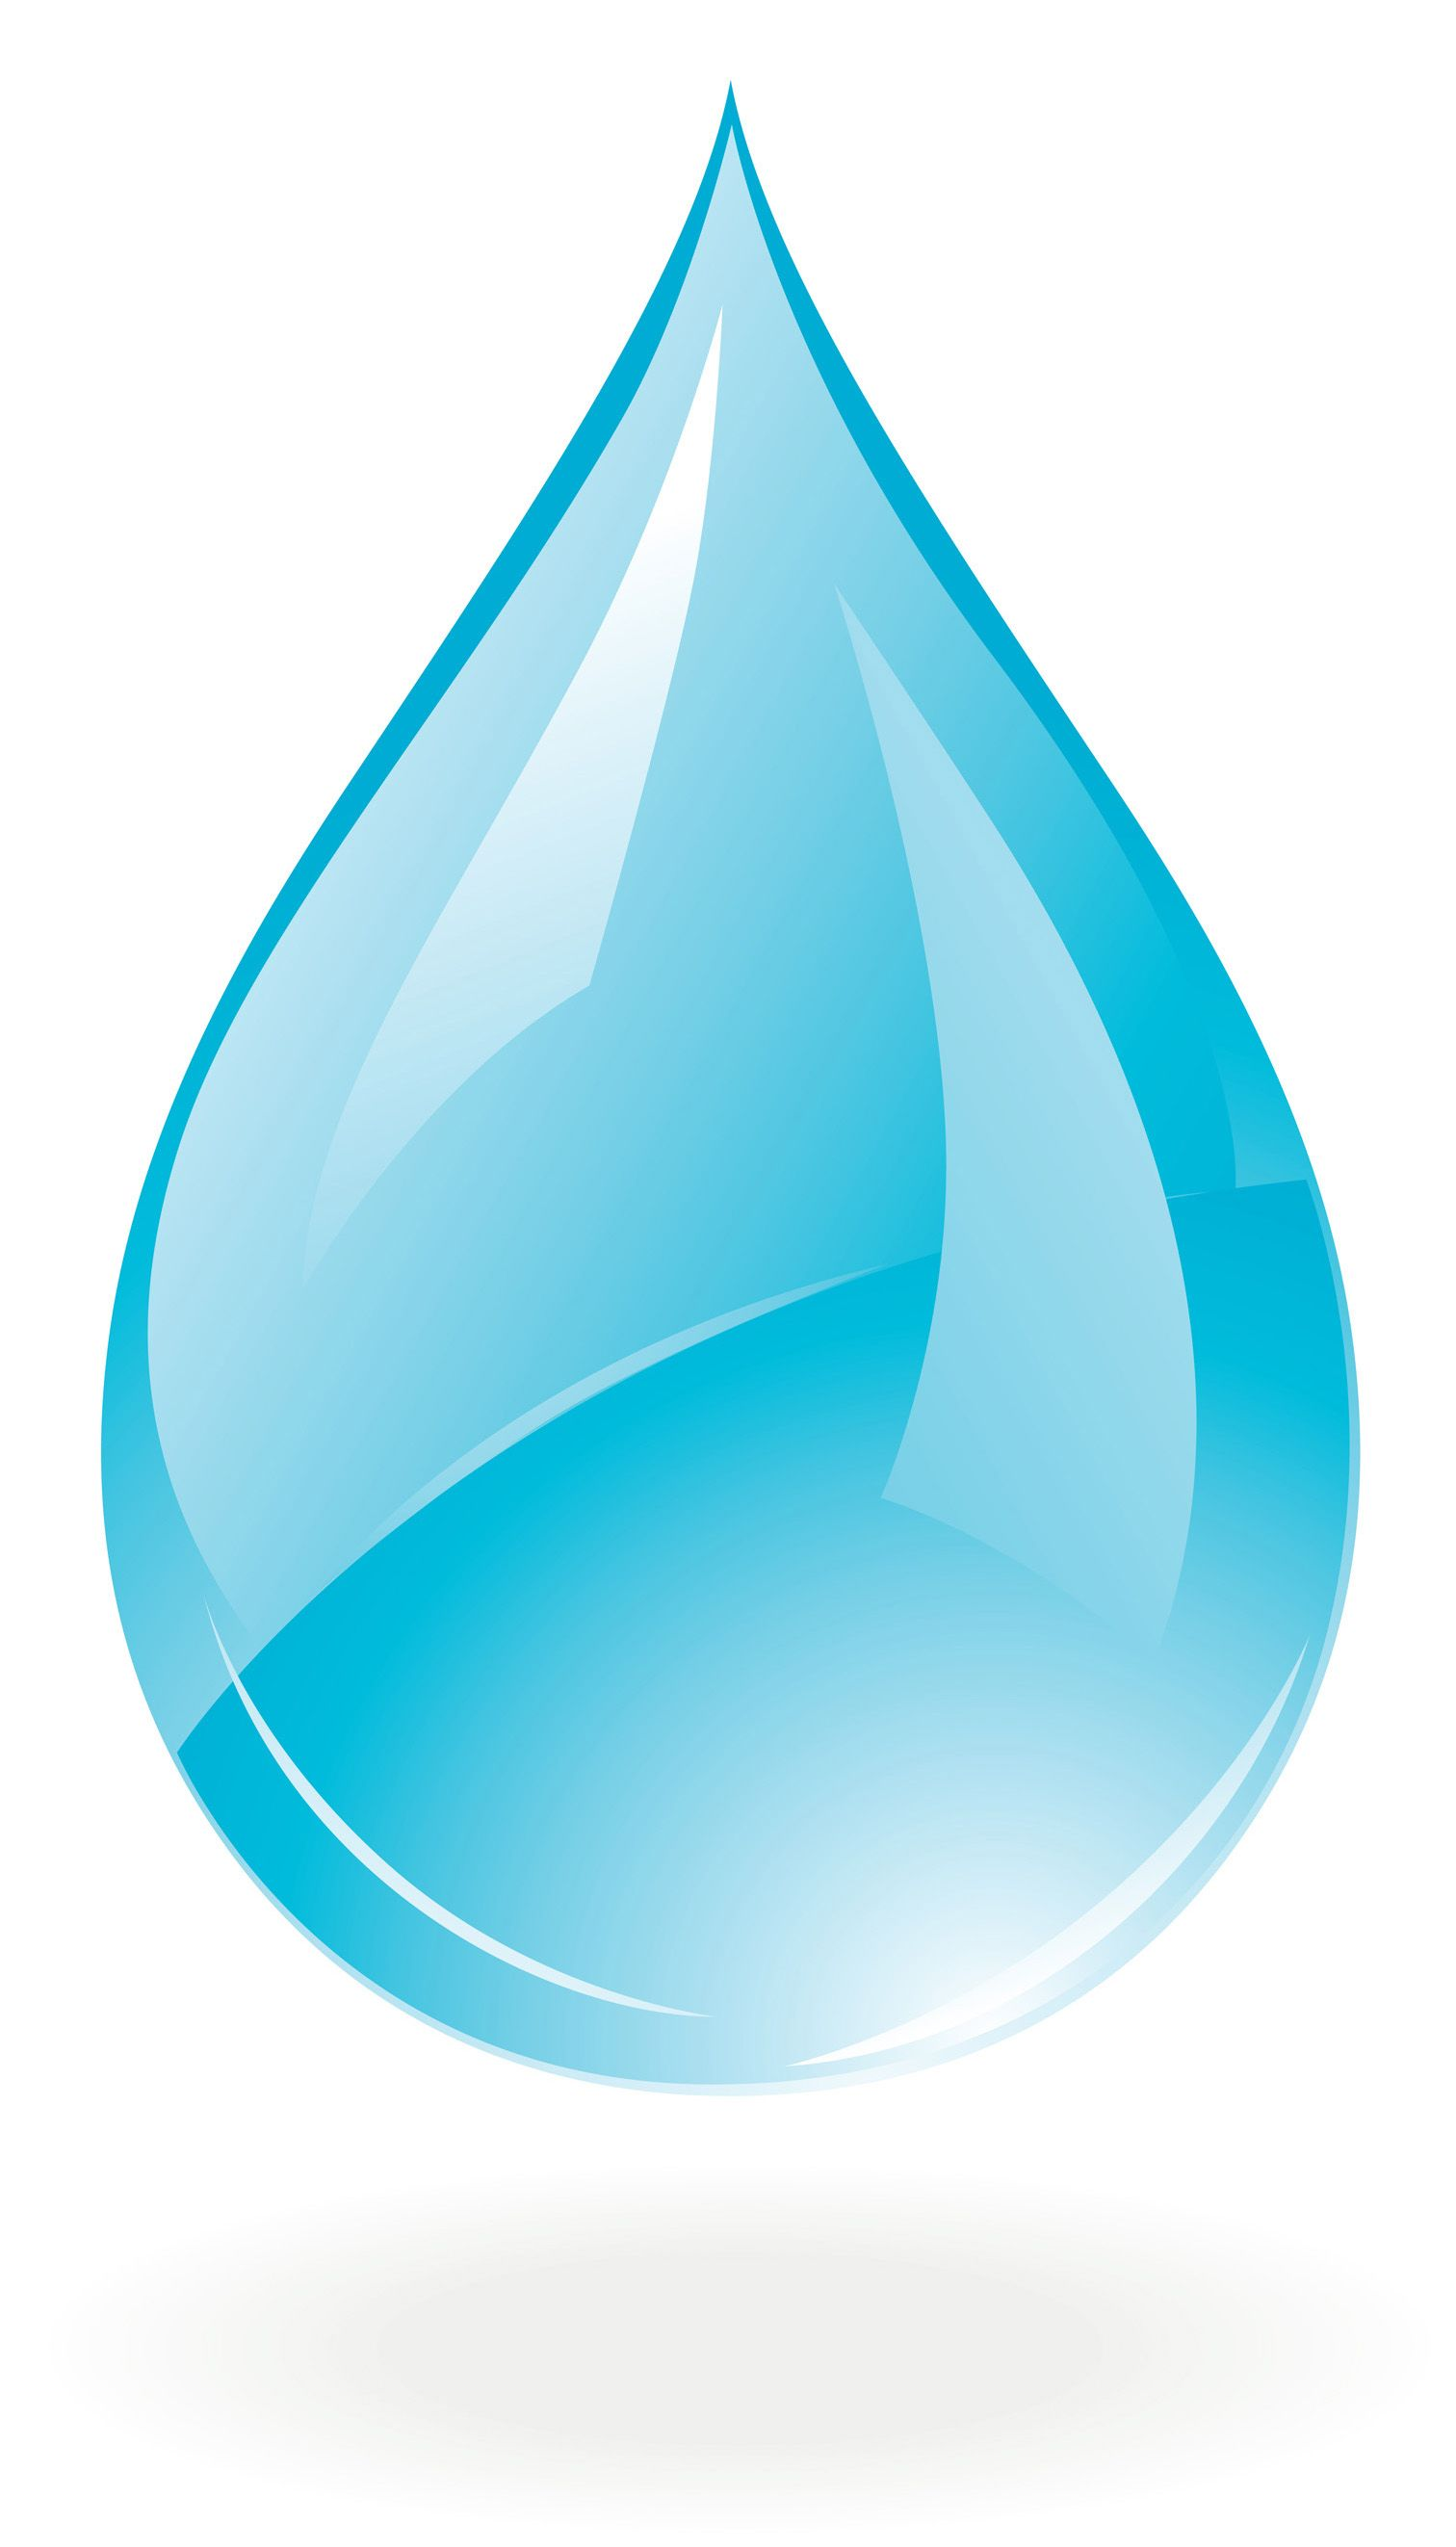 Water Drop Psd Clipart.